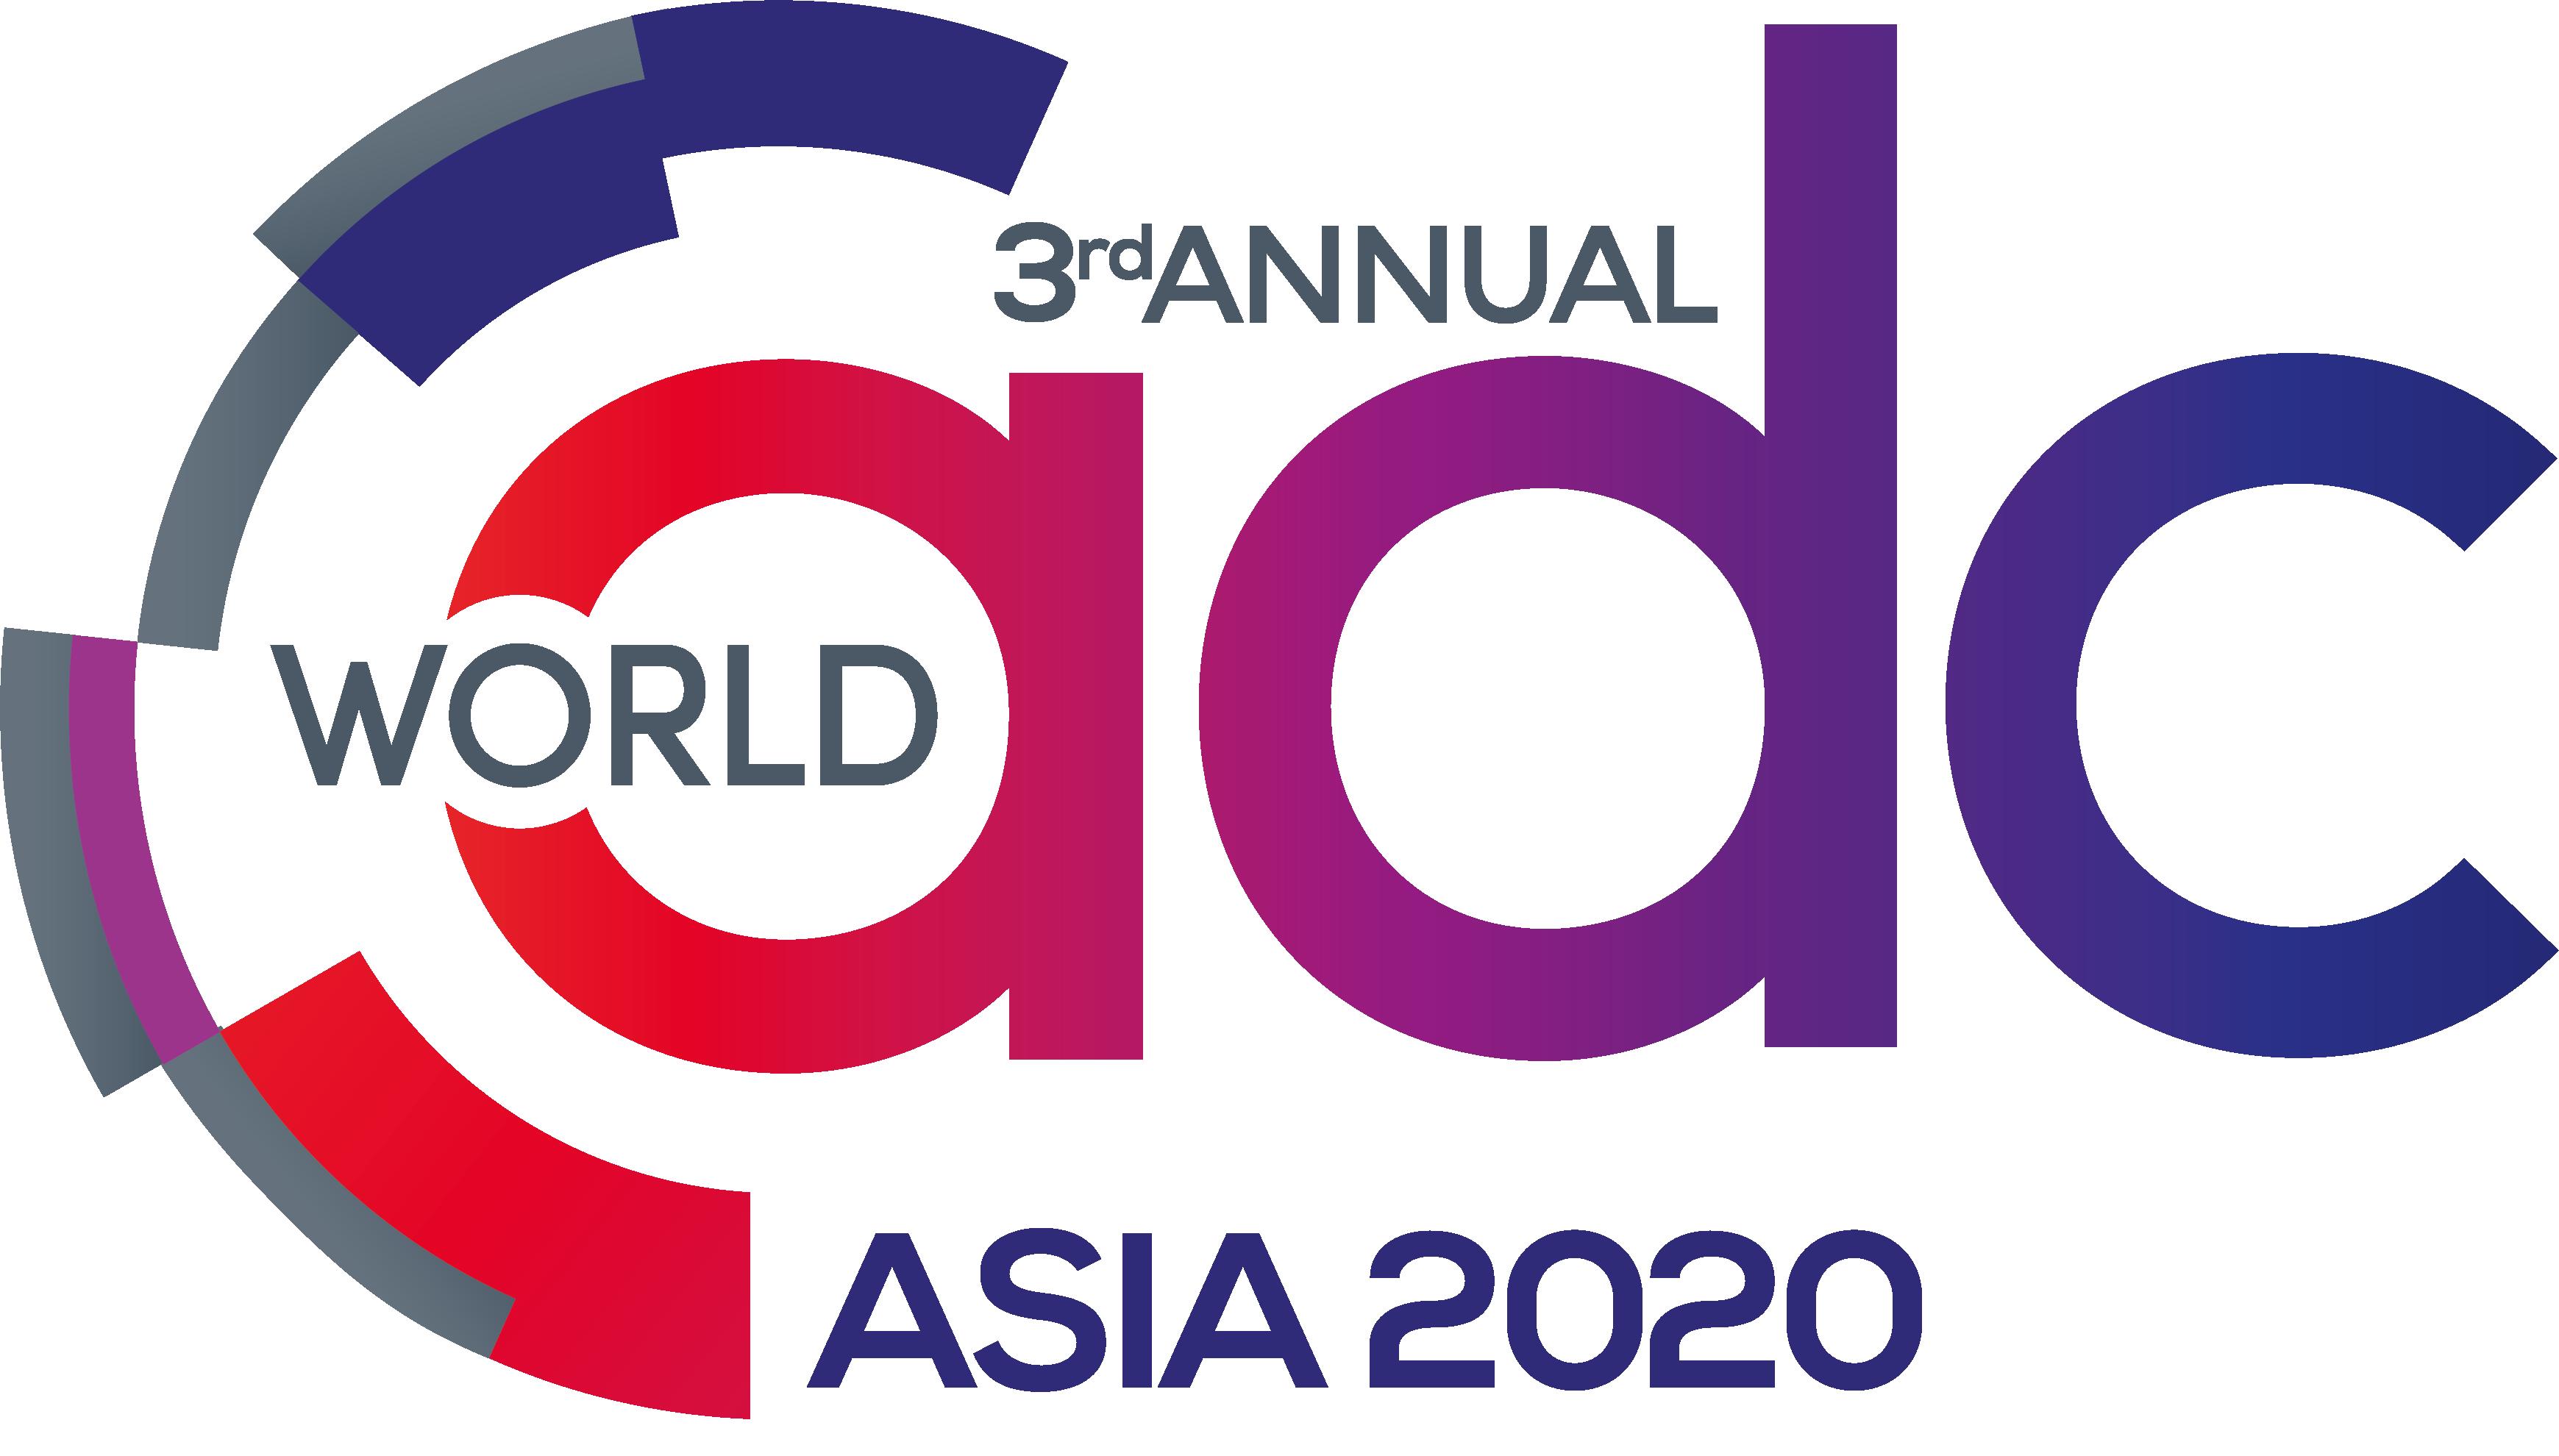 HW180812 ADC Asia 2020 logo FINAL